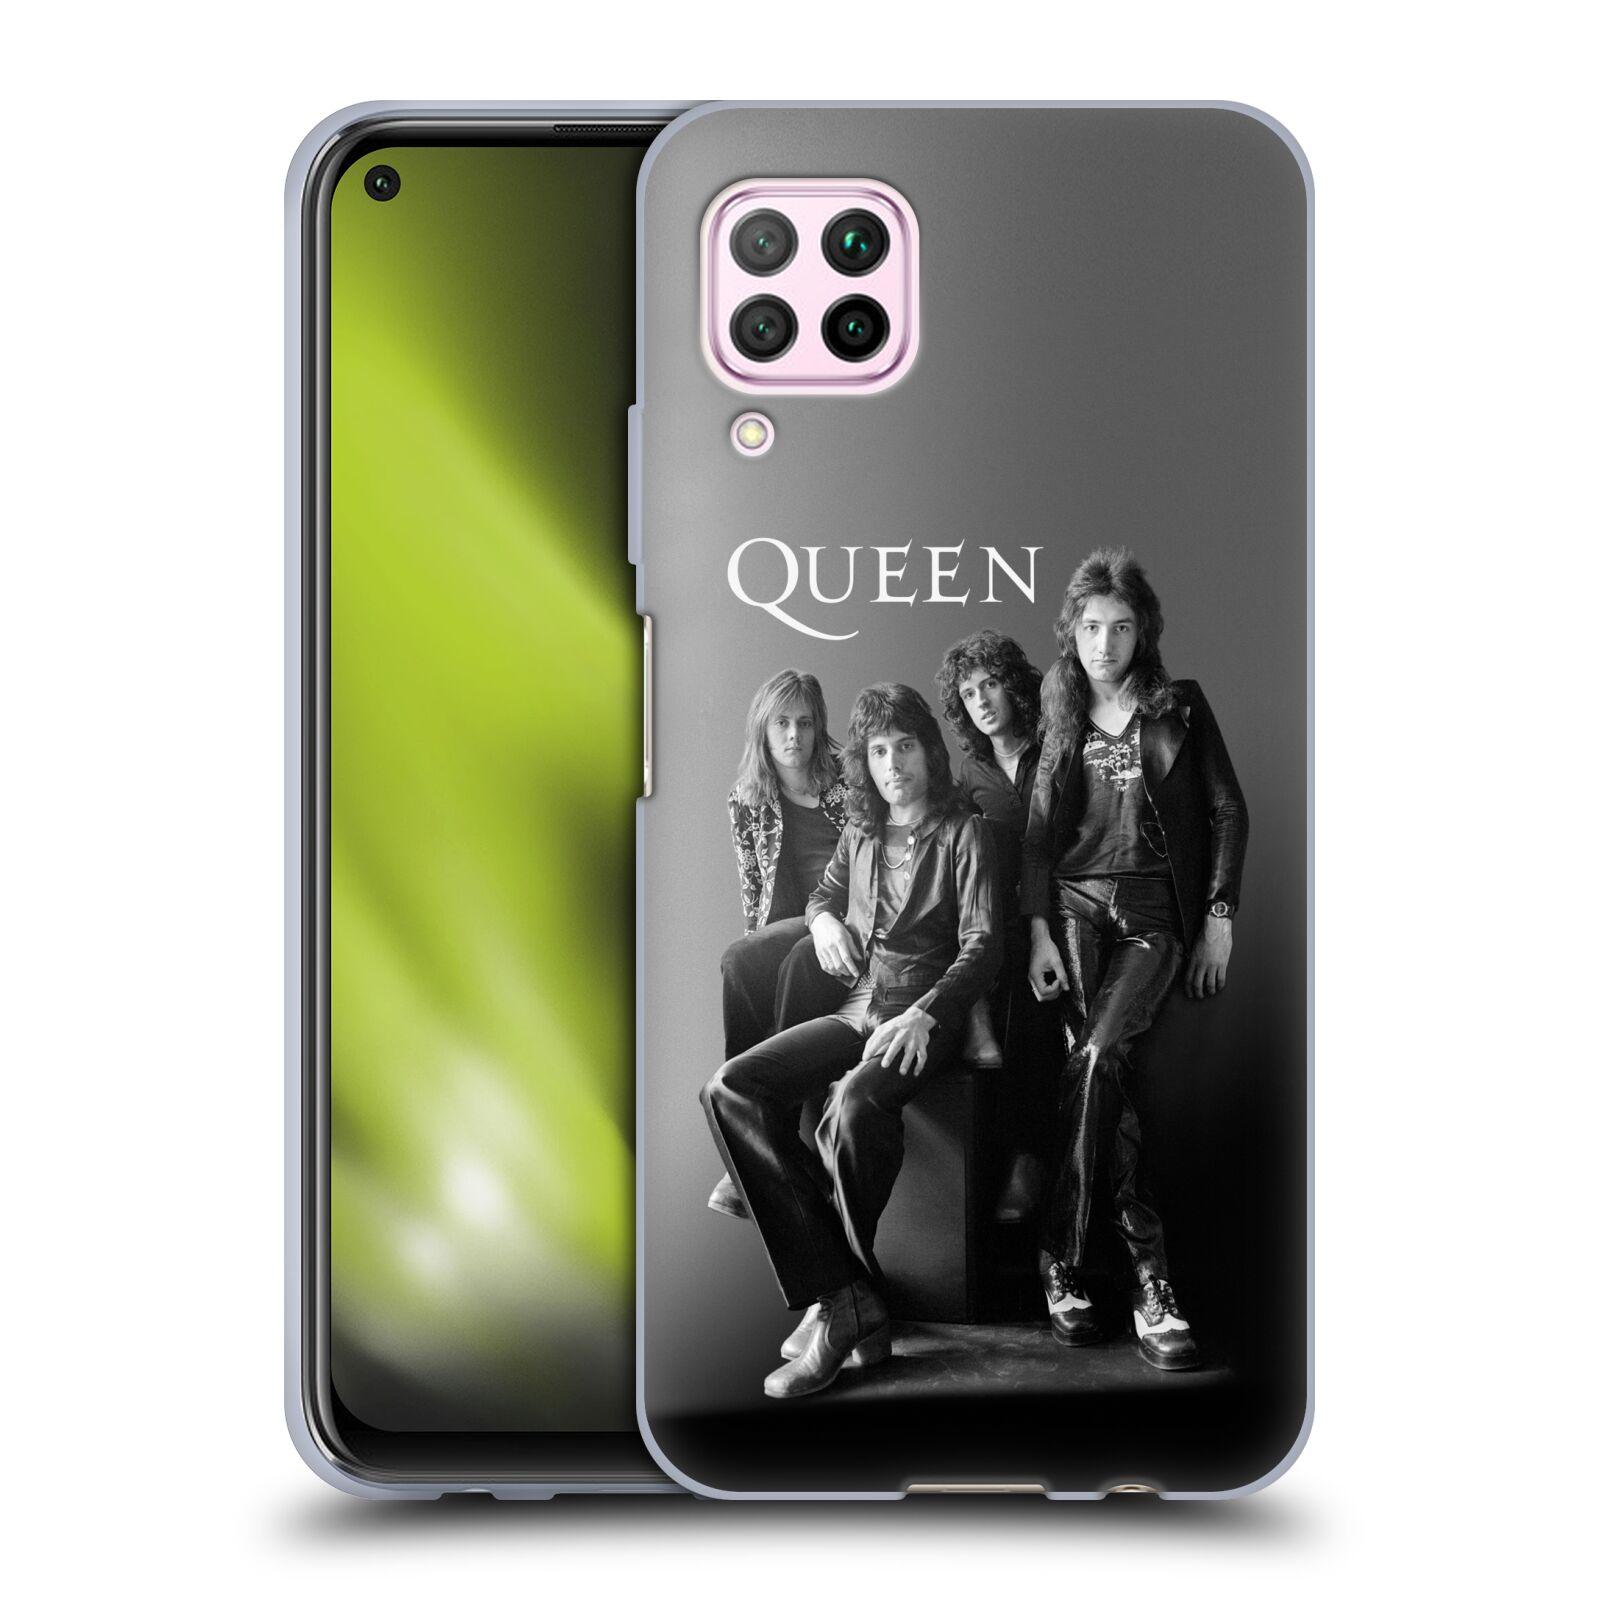 Silikonové pouzdro na mobil Huawei P40 Lite - Head Case - Queen - Skupina